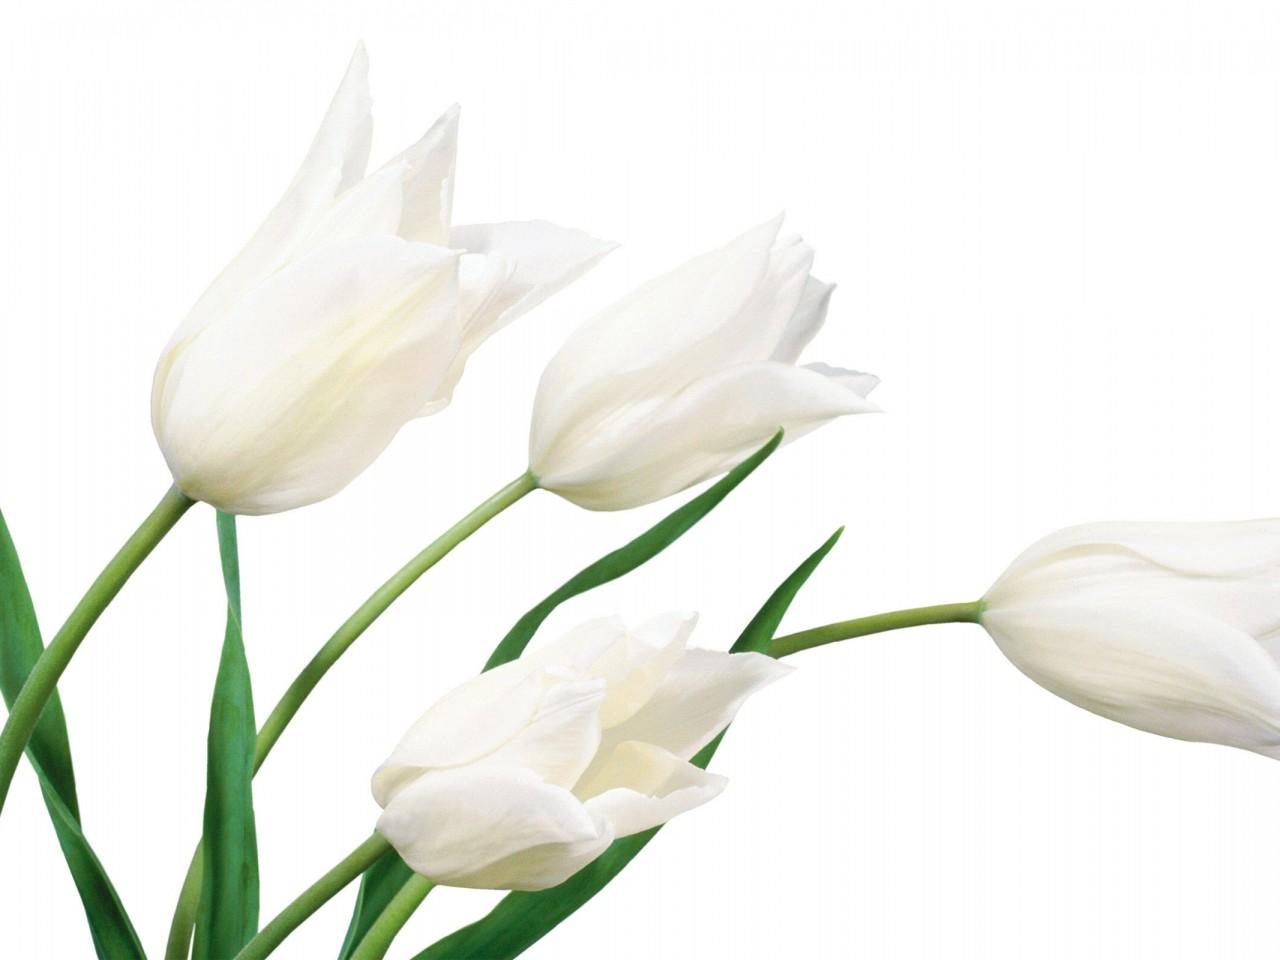 White flowers symbolism 10 widescreen wallpaper hdflowerwallpaper white flowers symbolism free wallpaper mightylinksfo Gallery